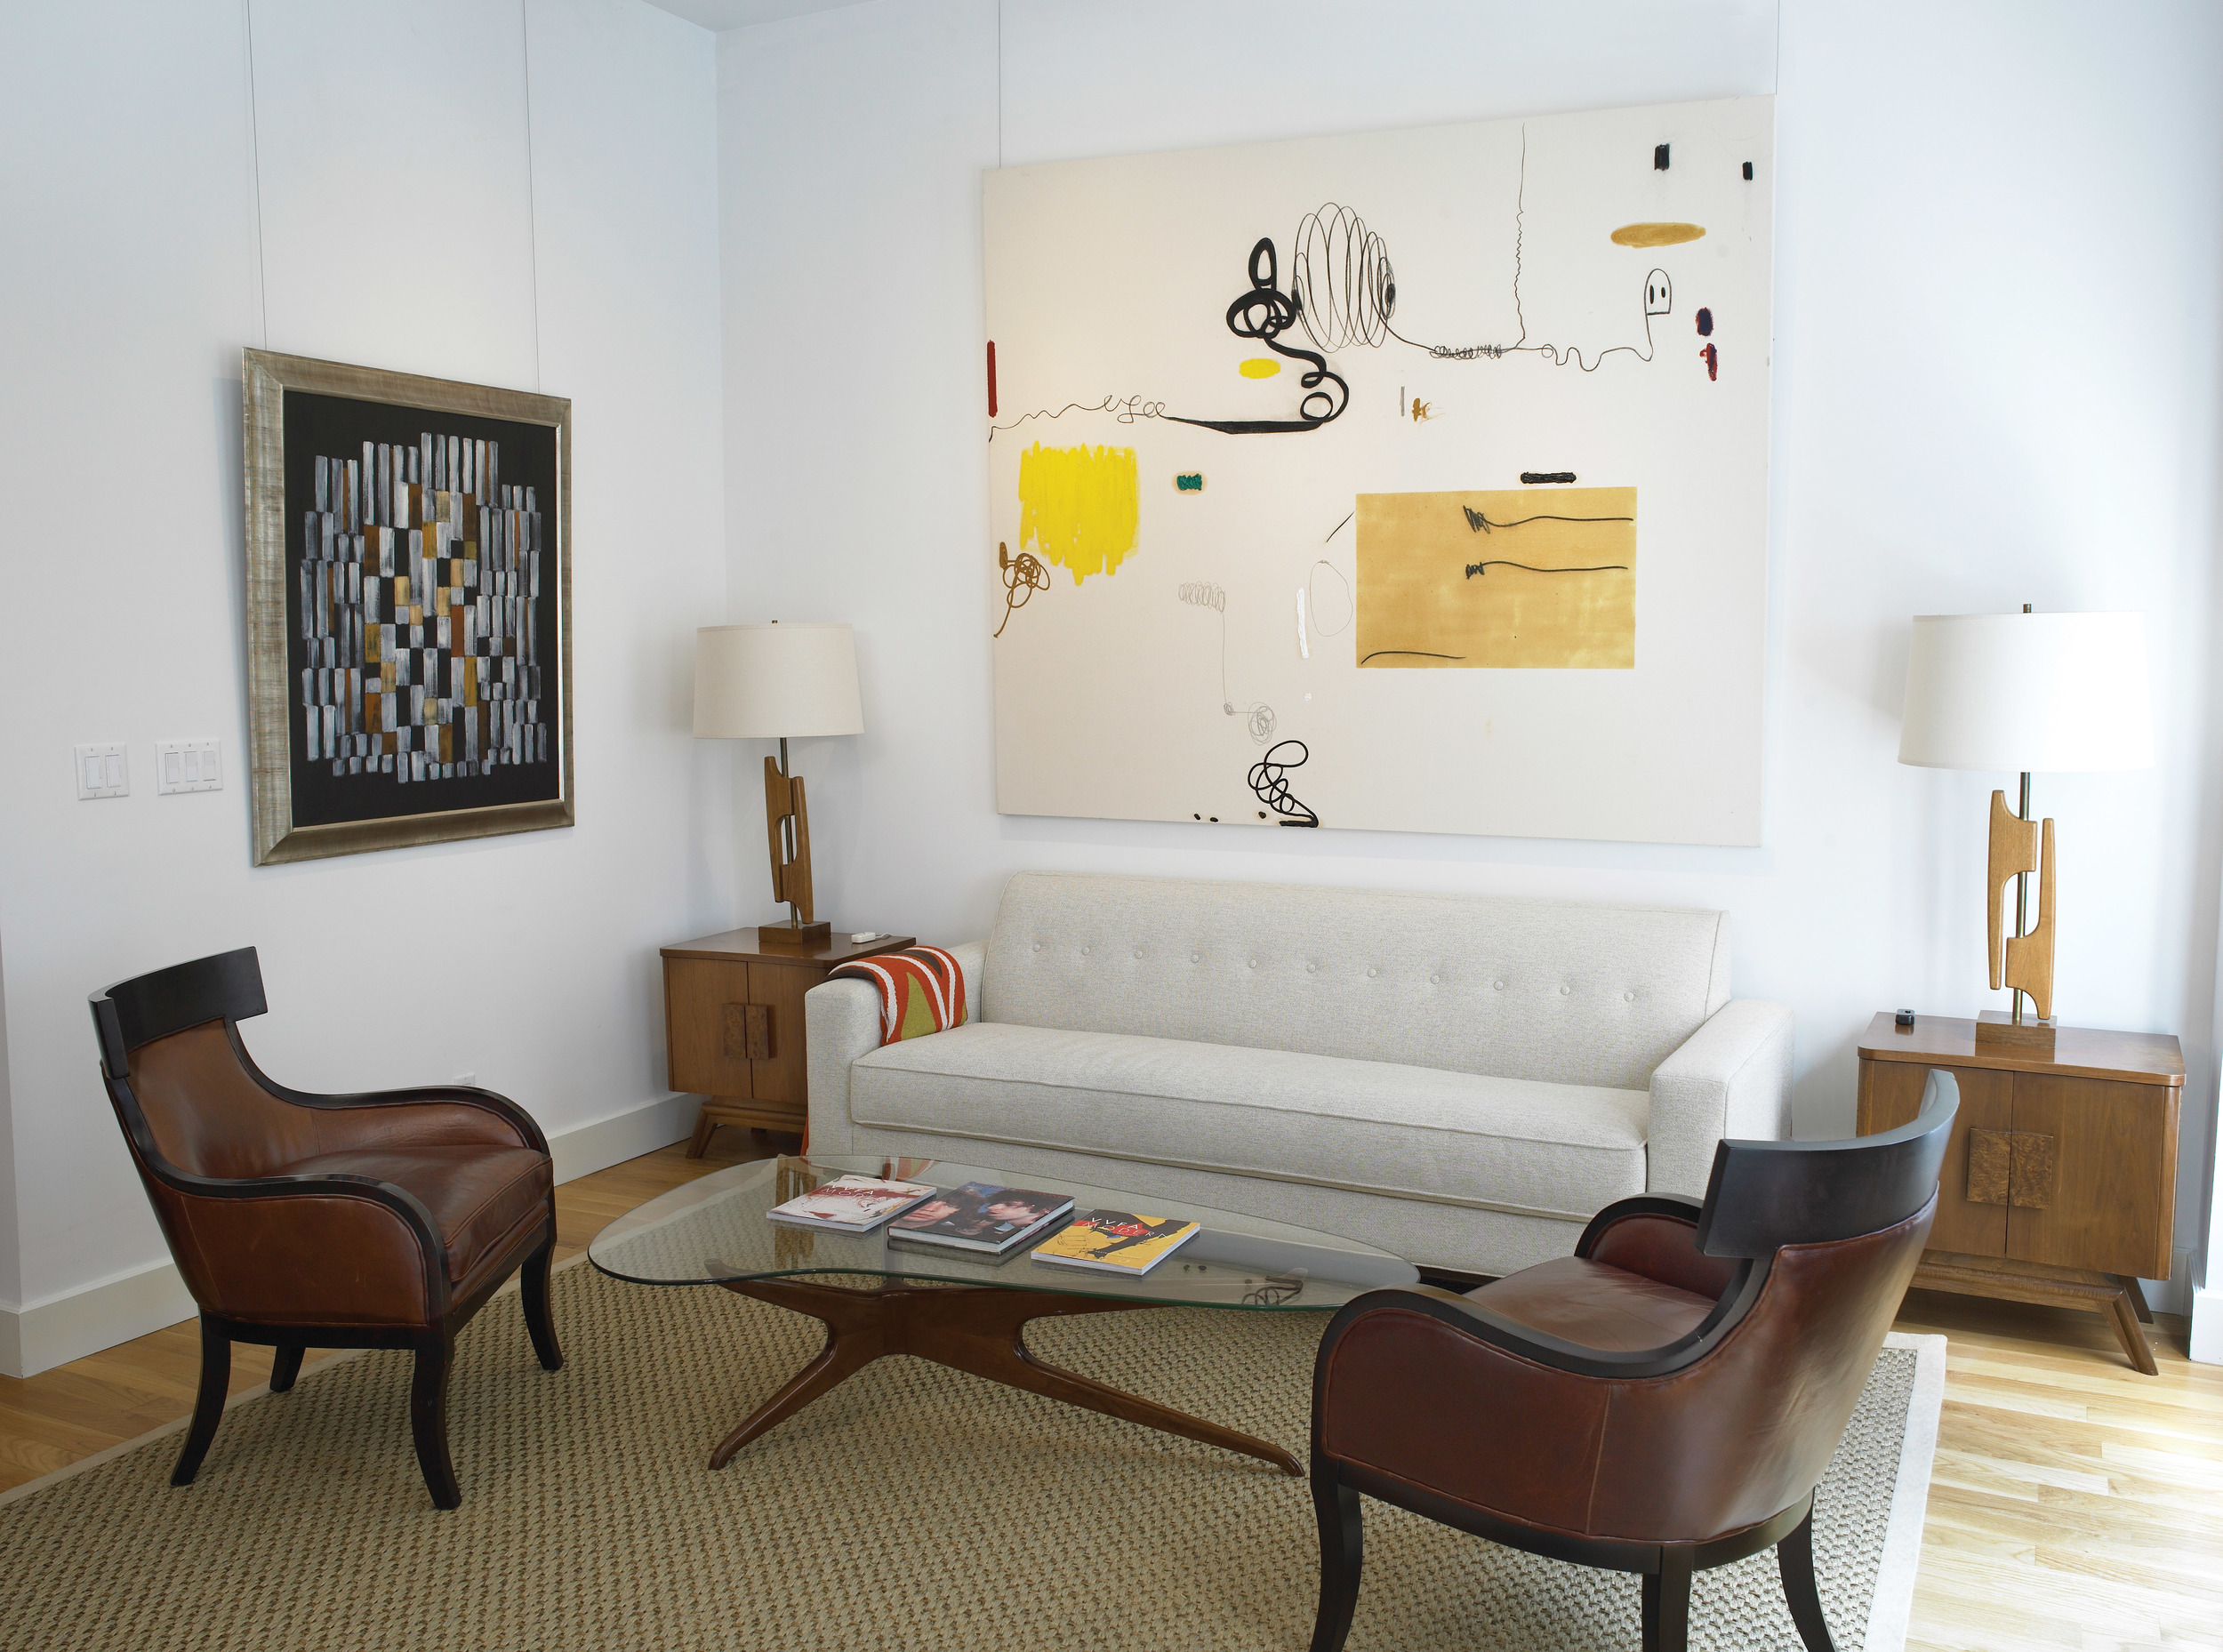 Untitled, 2014  in situ at Vallarino Fine Art, New York